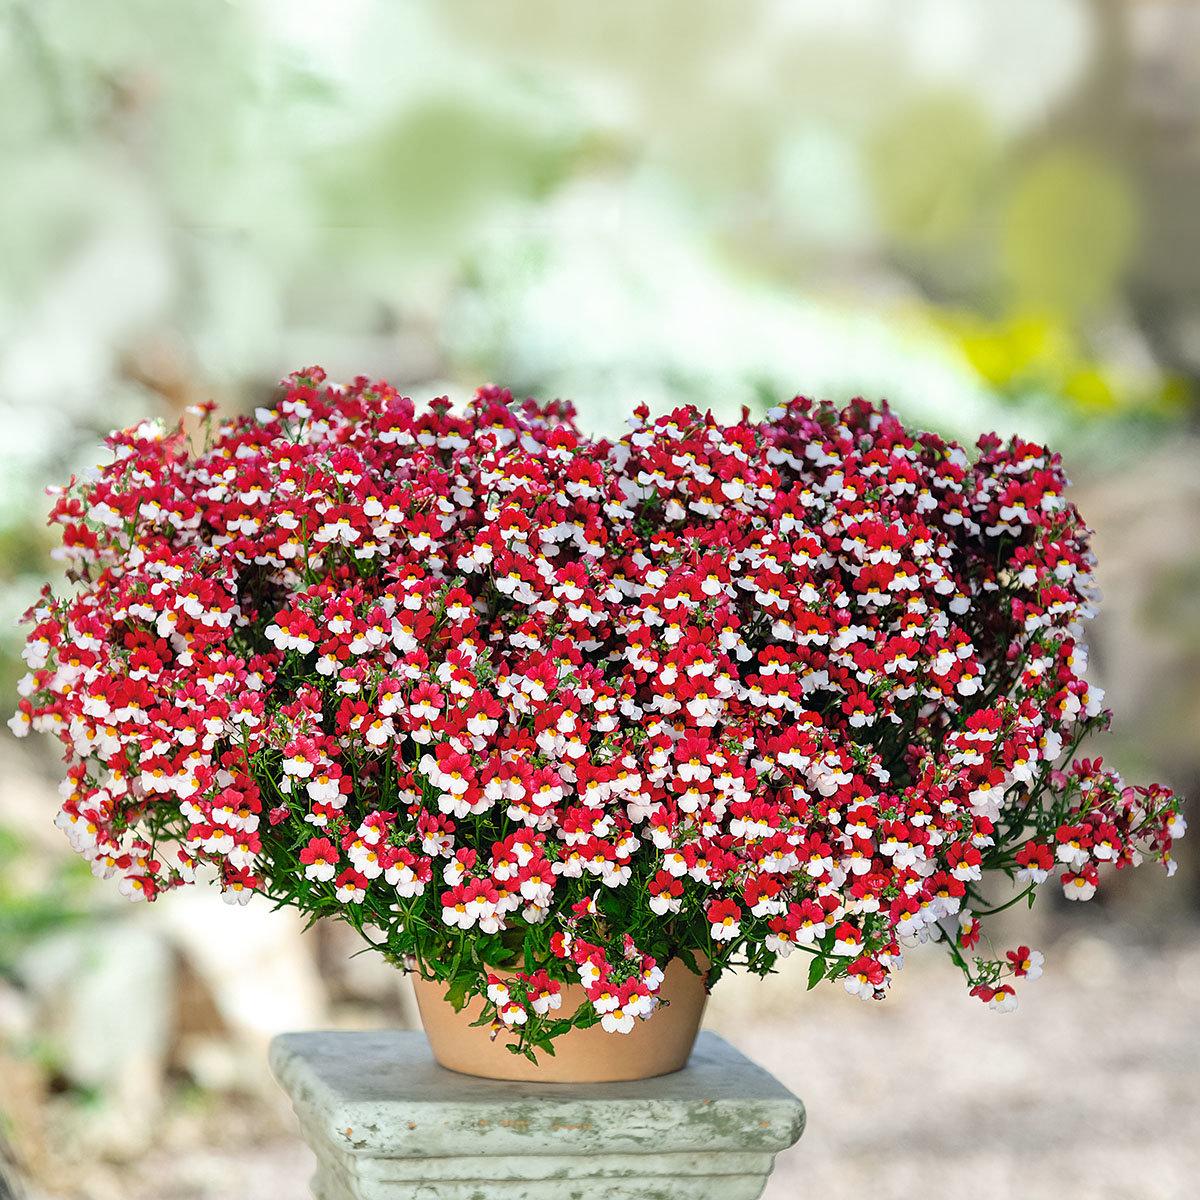 Elfenspiegel Sunsatia Cherry on Ice, im ca. 11 cm-Topf